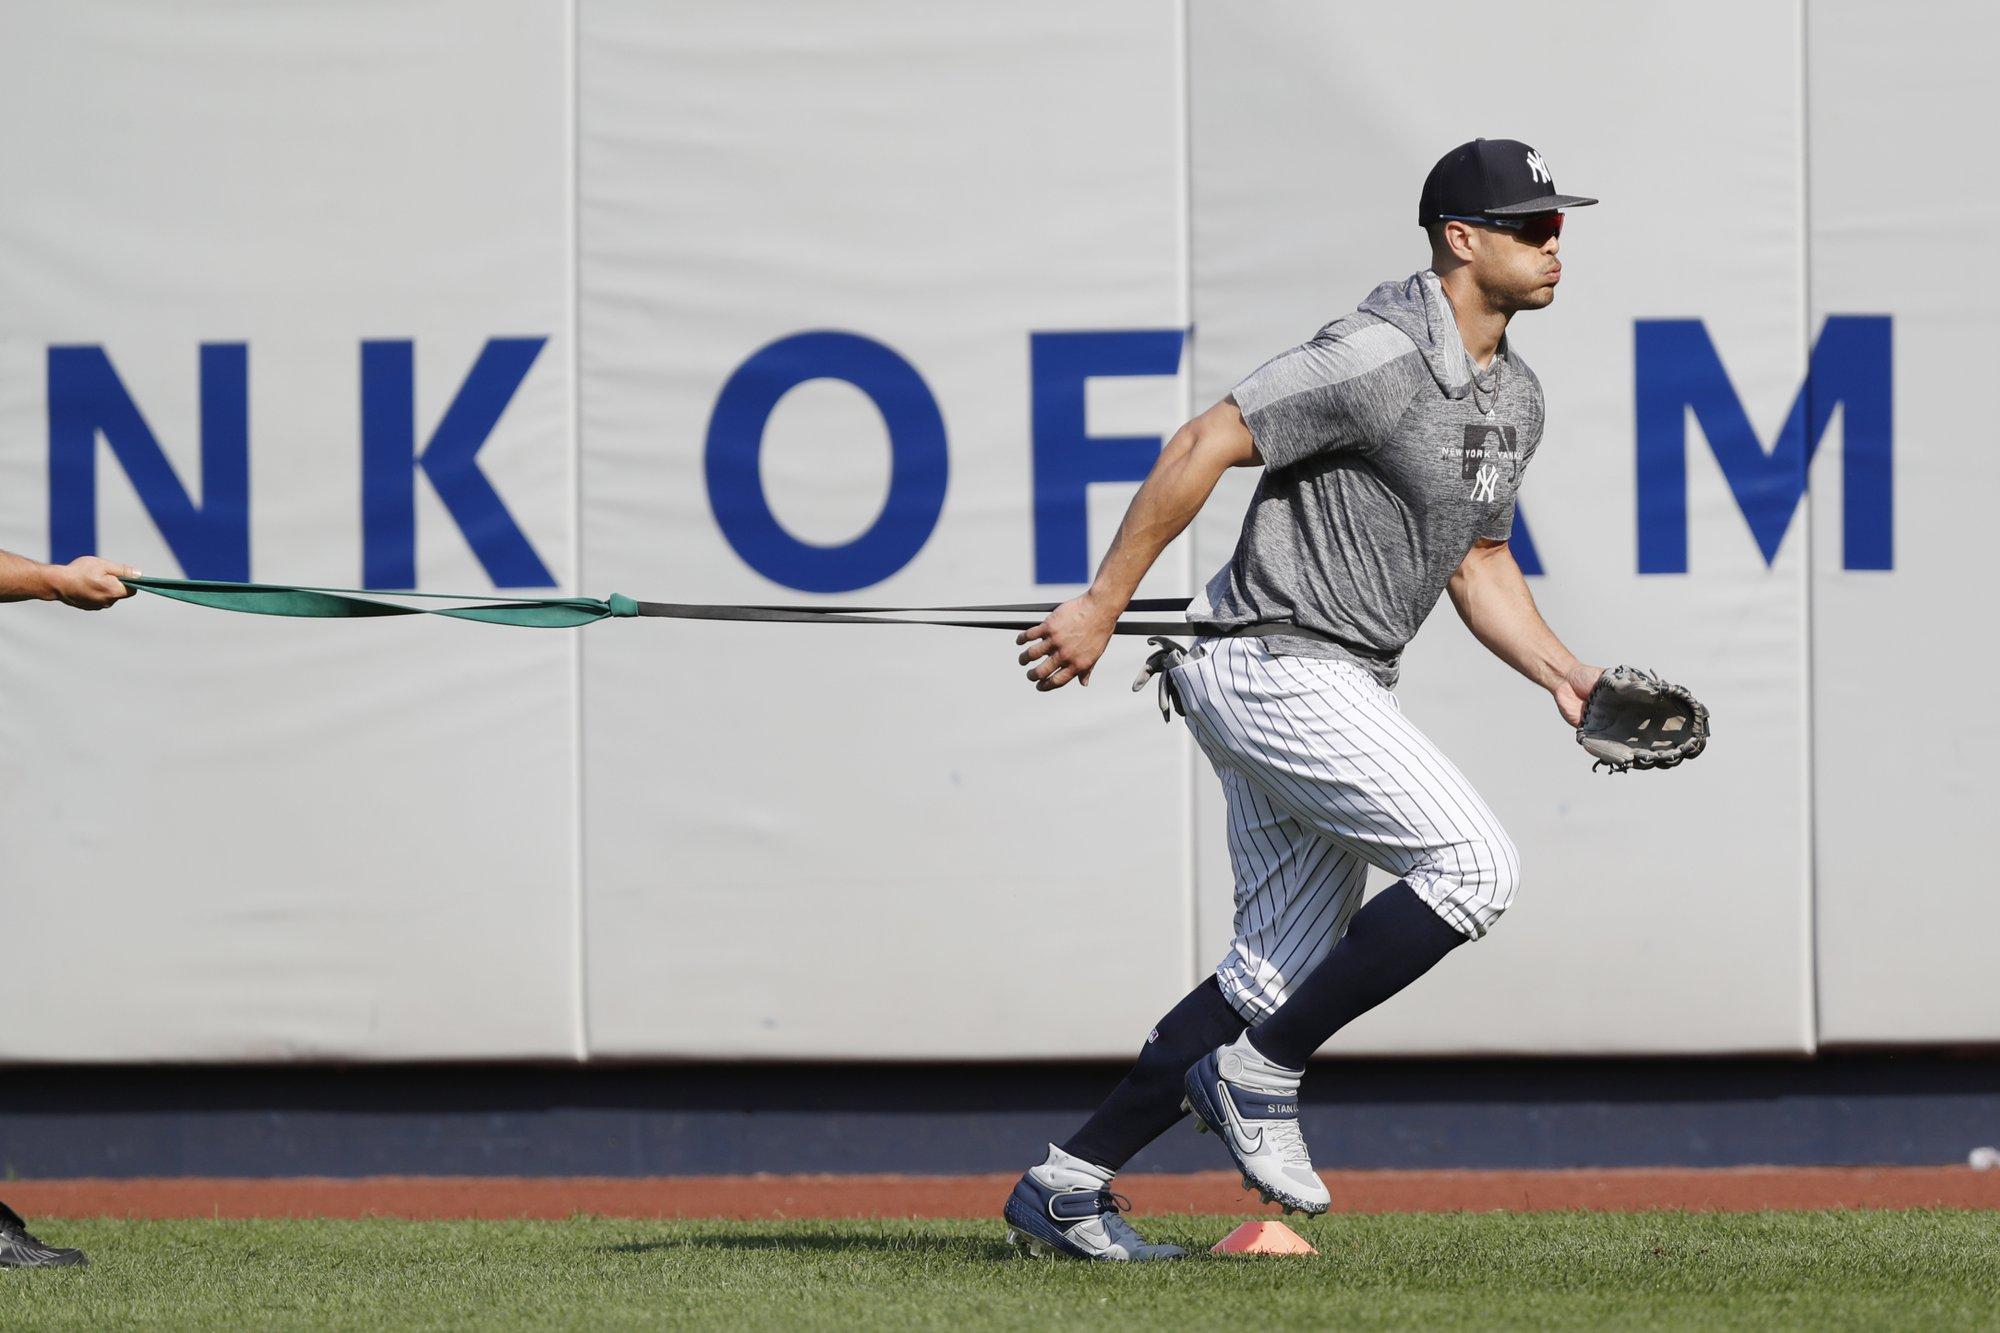 Stanton to increase batting practice ahead of return